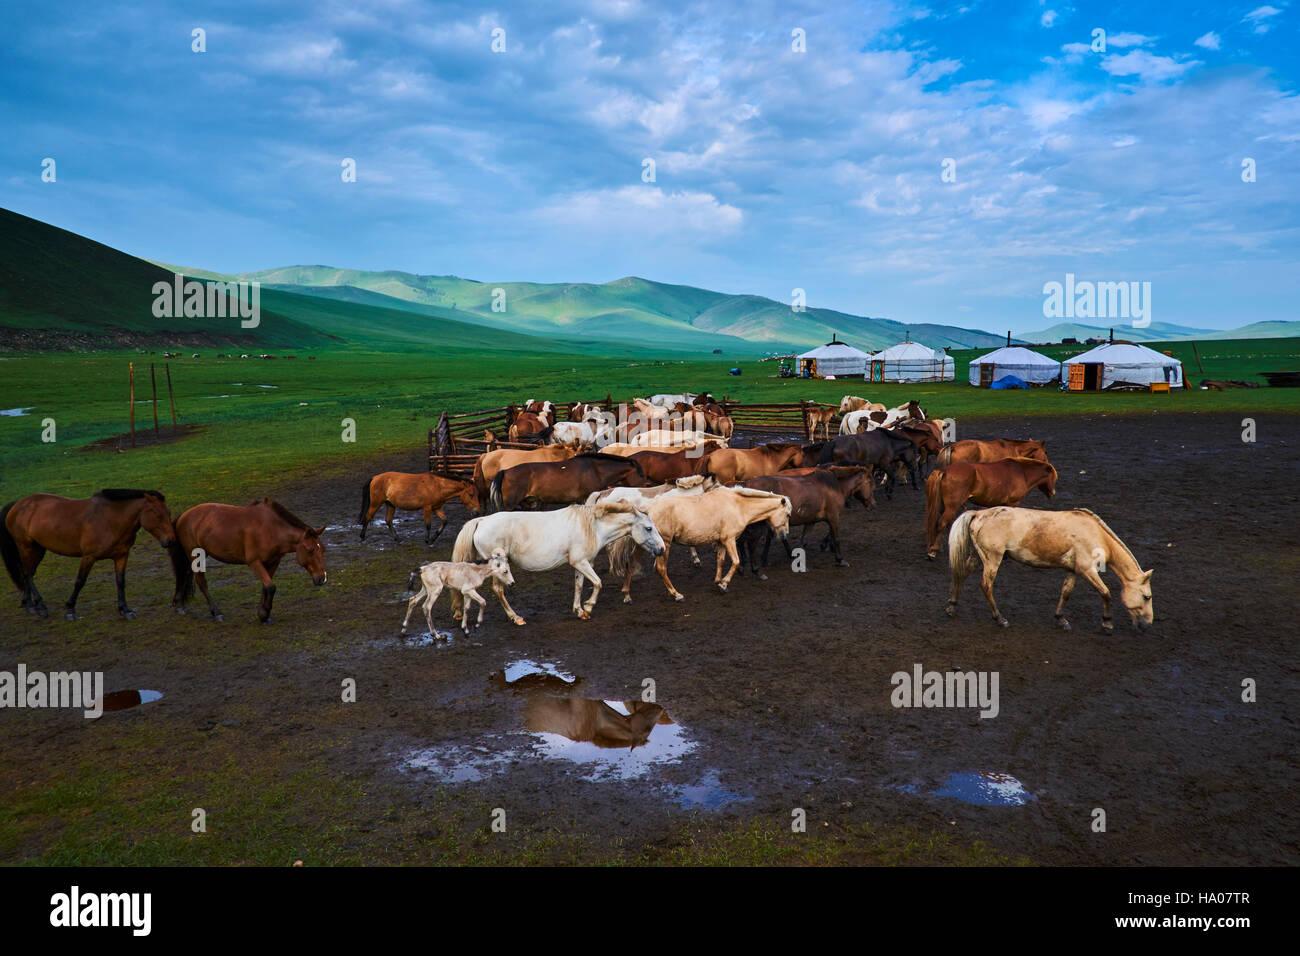 Mongolia, provincia Ovorkhangai, Orkhon Valley, campamento nómada Imagen De Stock